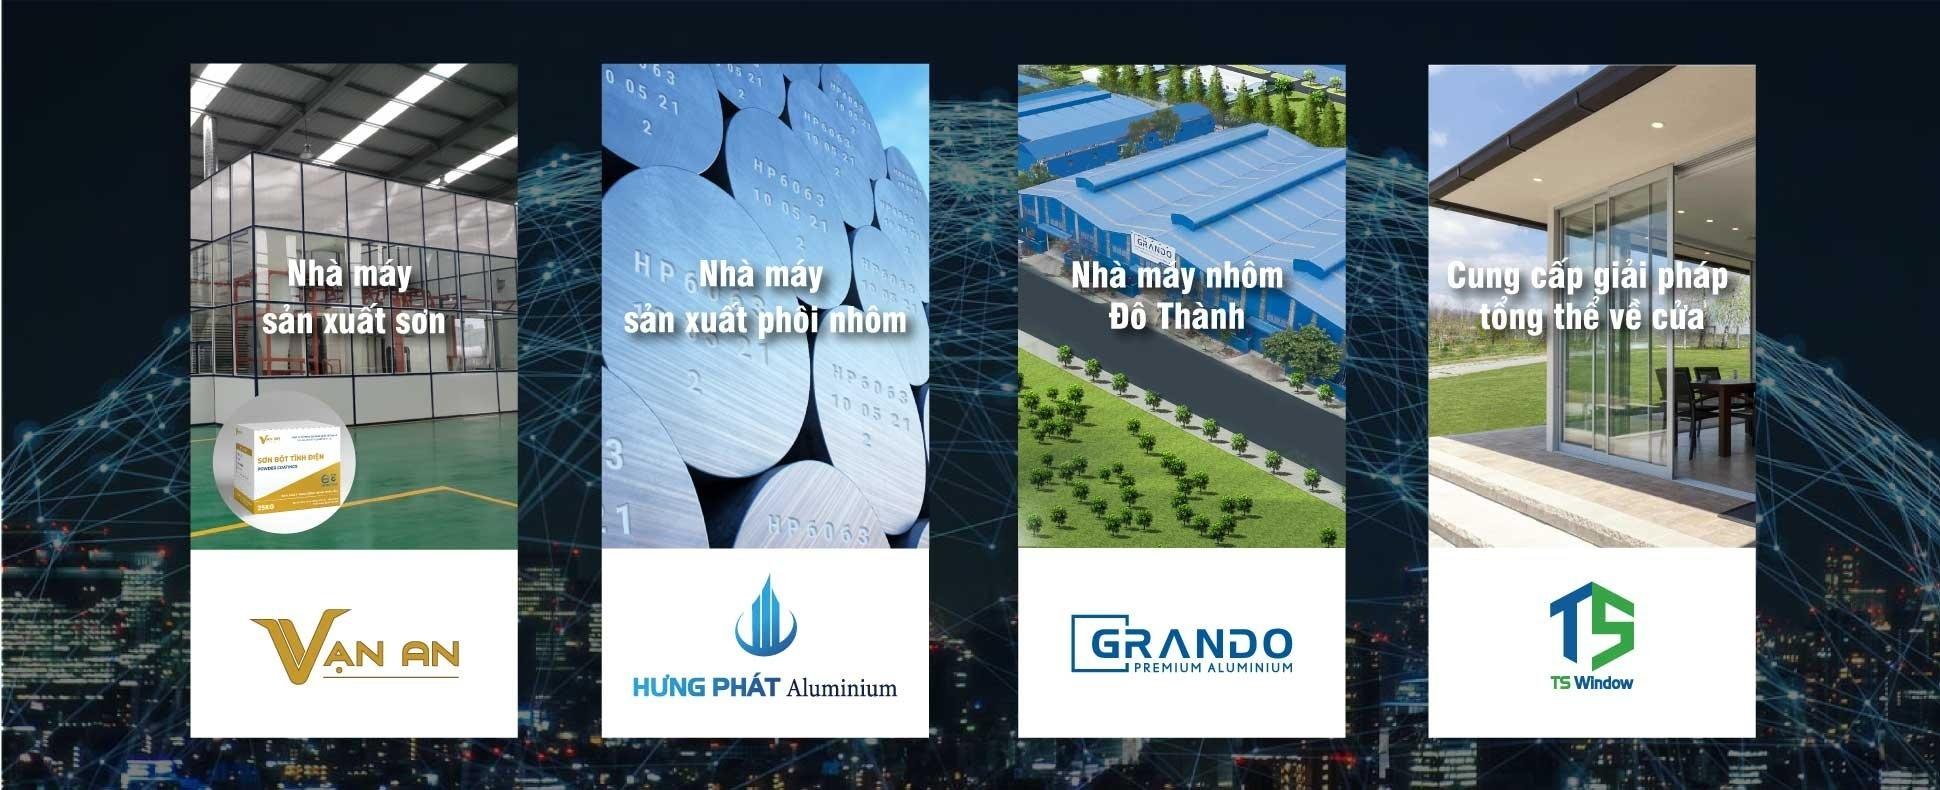 do thanh aluminium factory